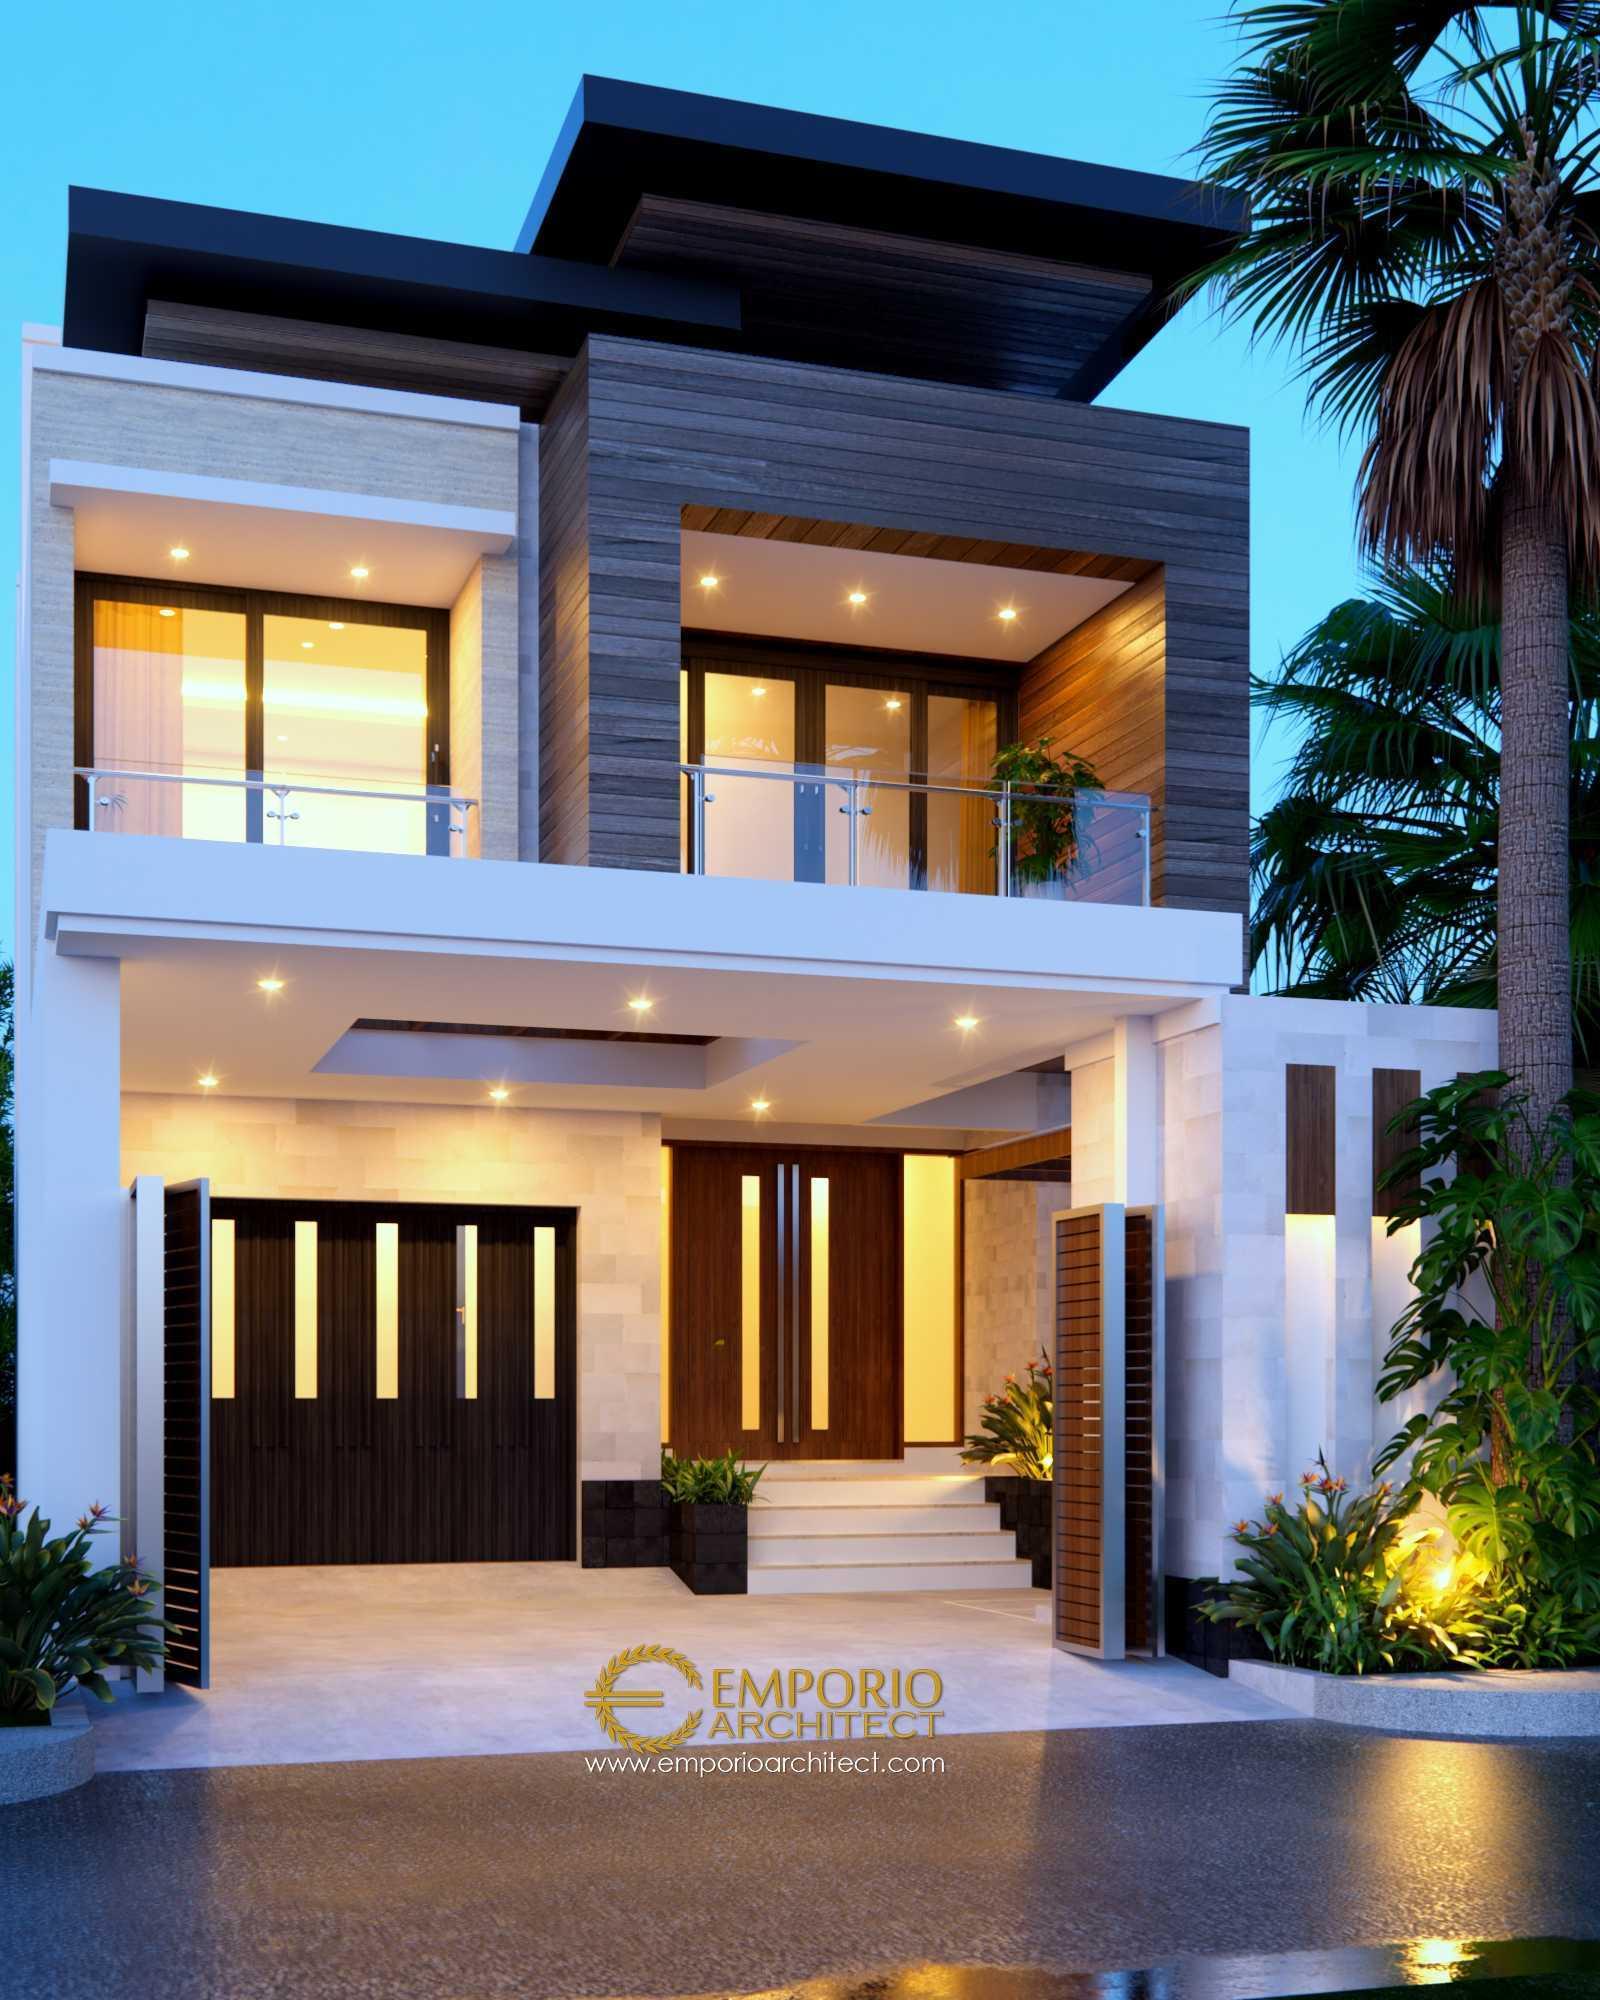 Emporio Architect di Semarang